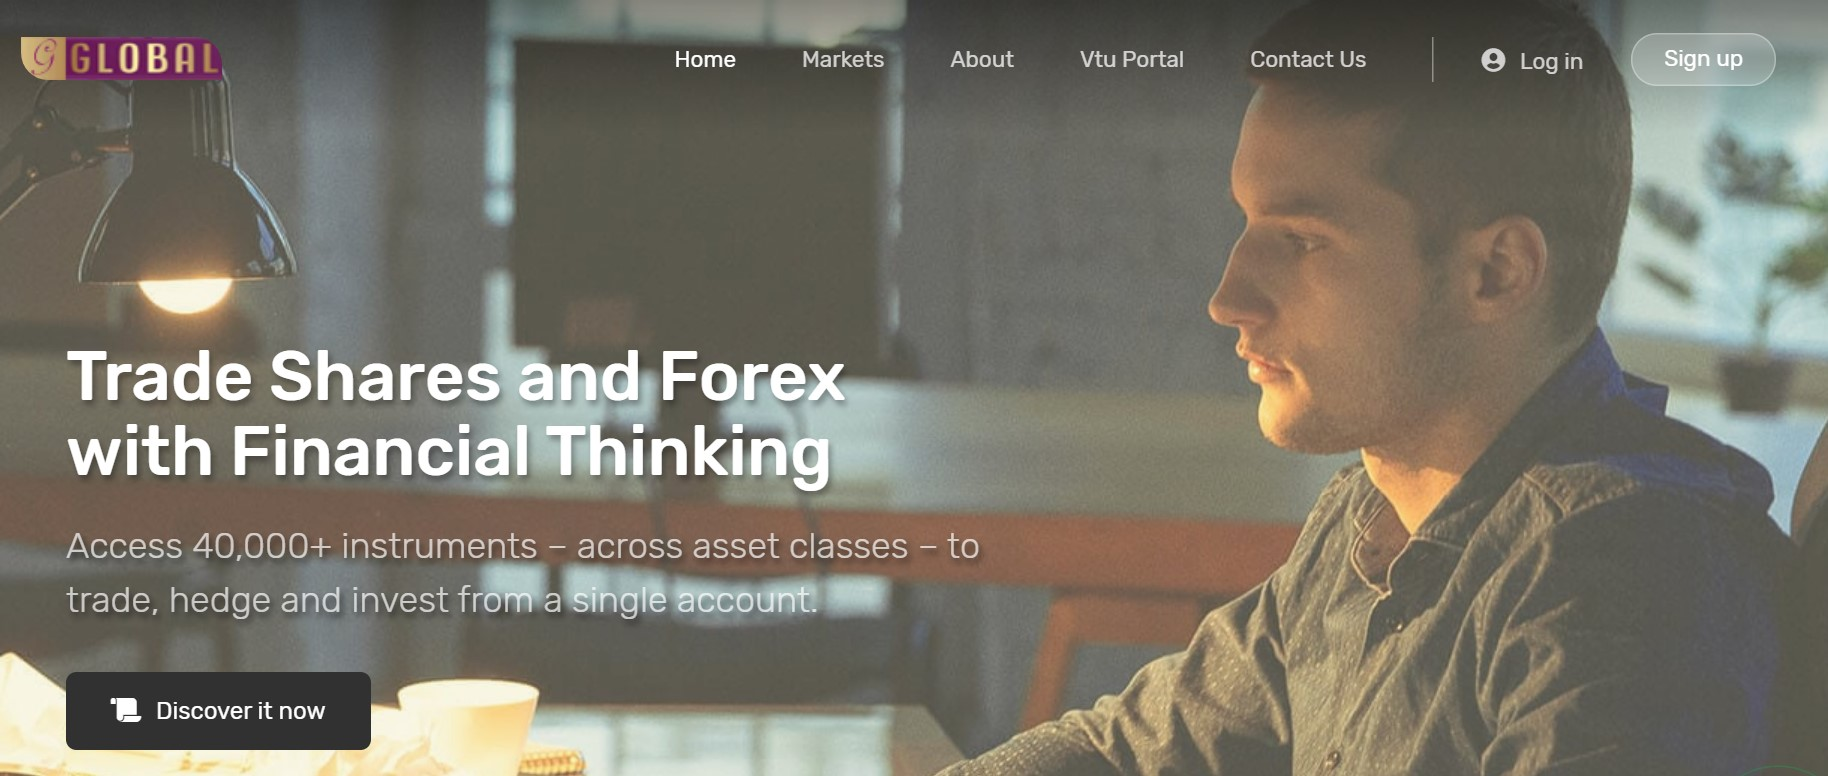 Global Forex Trade website